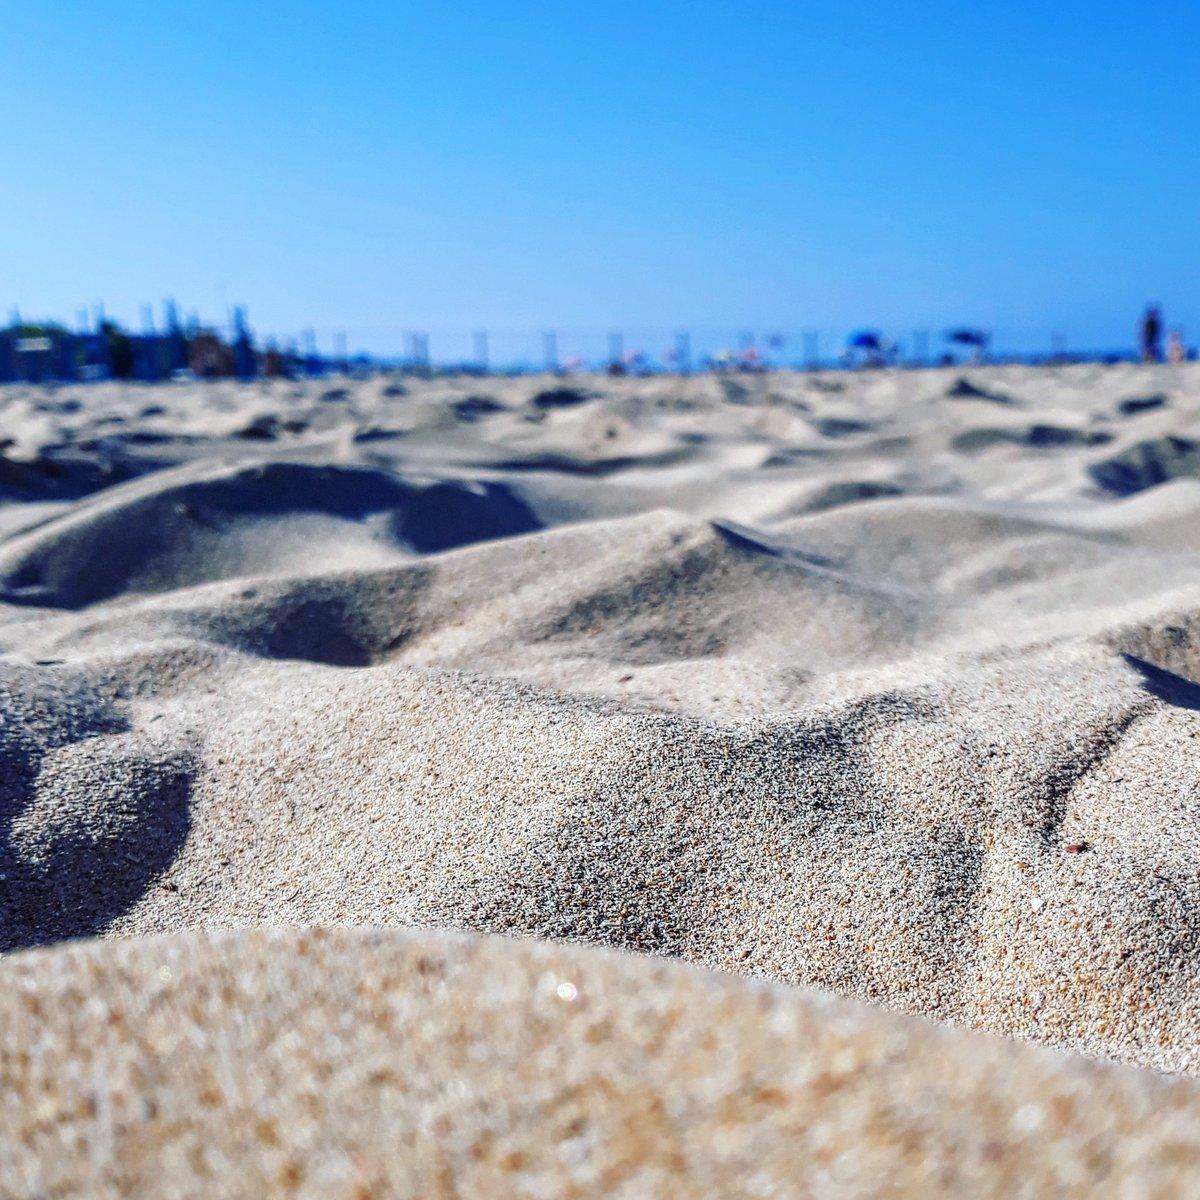 http:// www.instagram.com/p/BoHAUyyHg2C/sabbia e orizzonti#sand #horizon #landscape #beach #summer #sea #sky #bluesky #macro #september #lastdayofsummer #seabyautumn #sabbia #orizzonte #spiaggia #mare #estate #cielo #cieloazzurro #settembre #ultimogiornodestate #maredautunno #pescara  - Ukustom